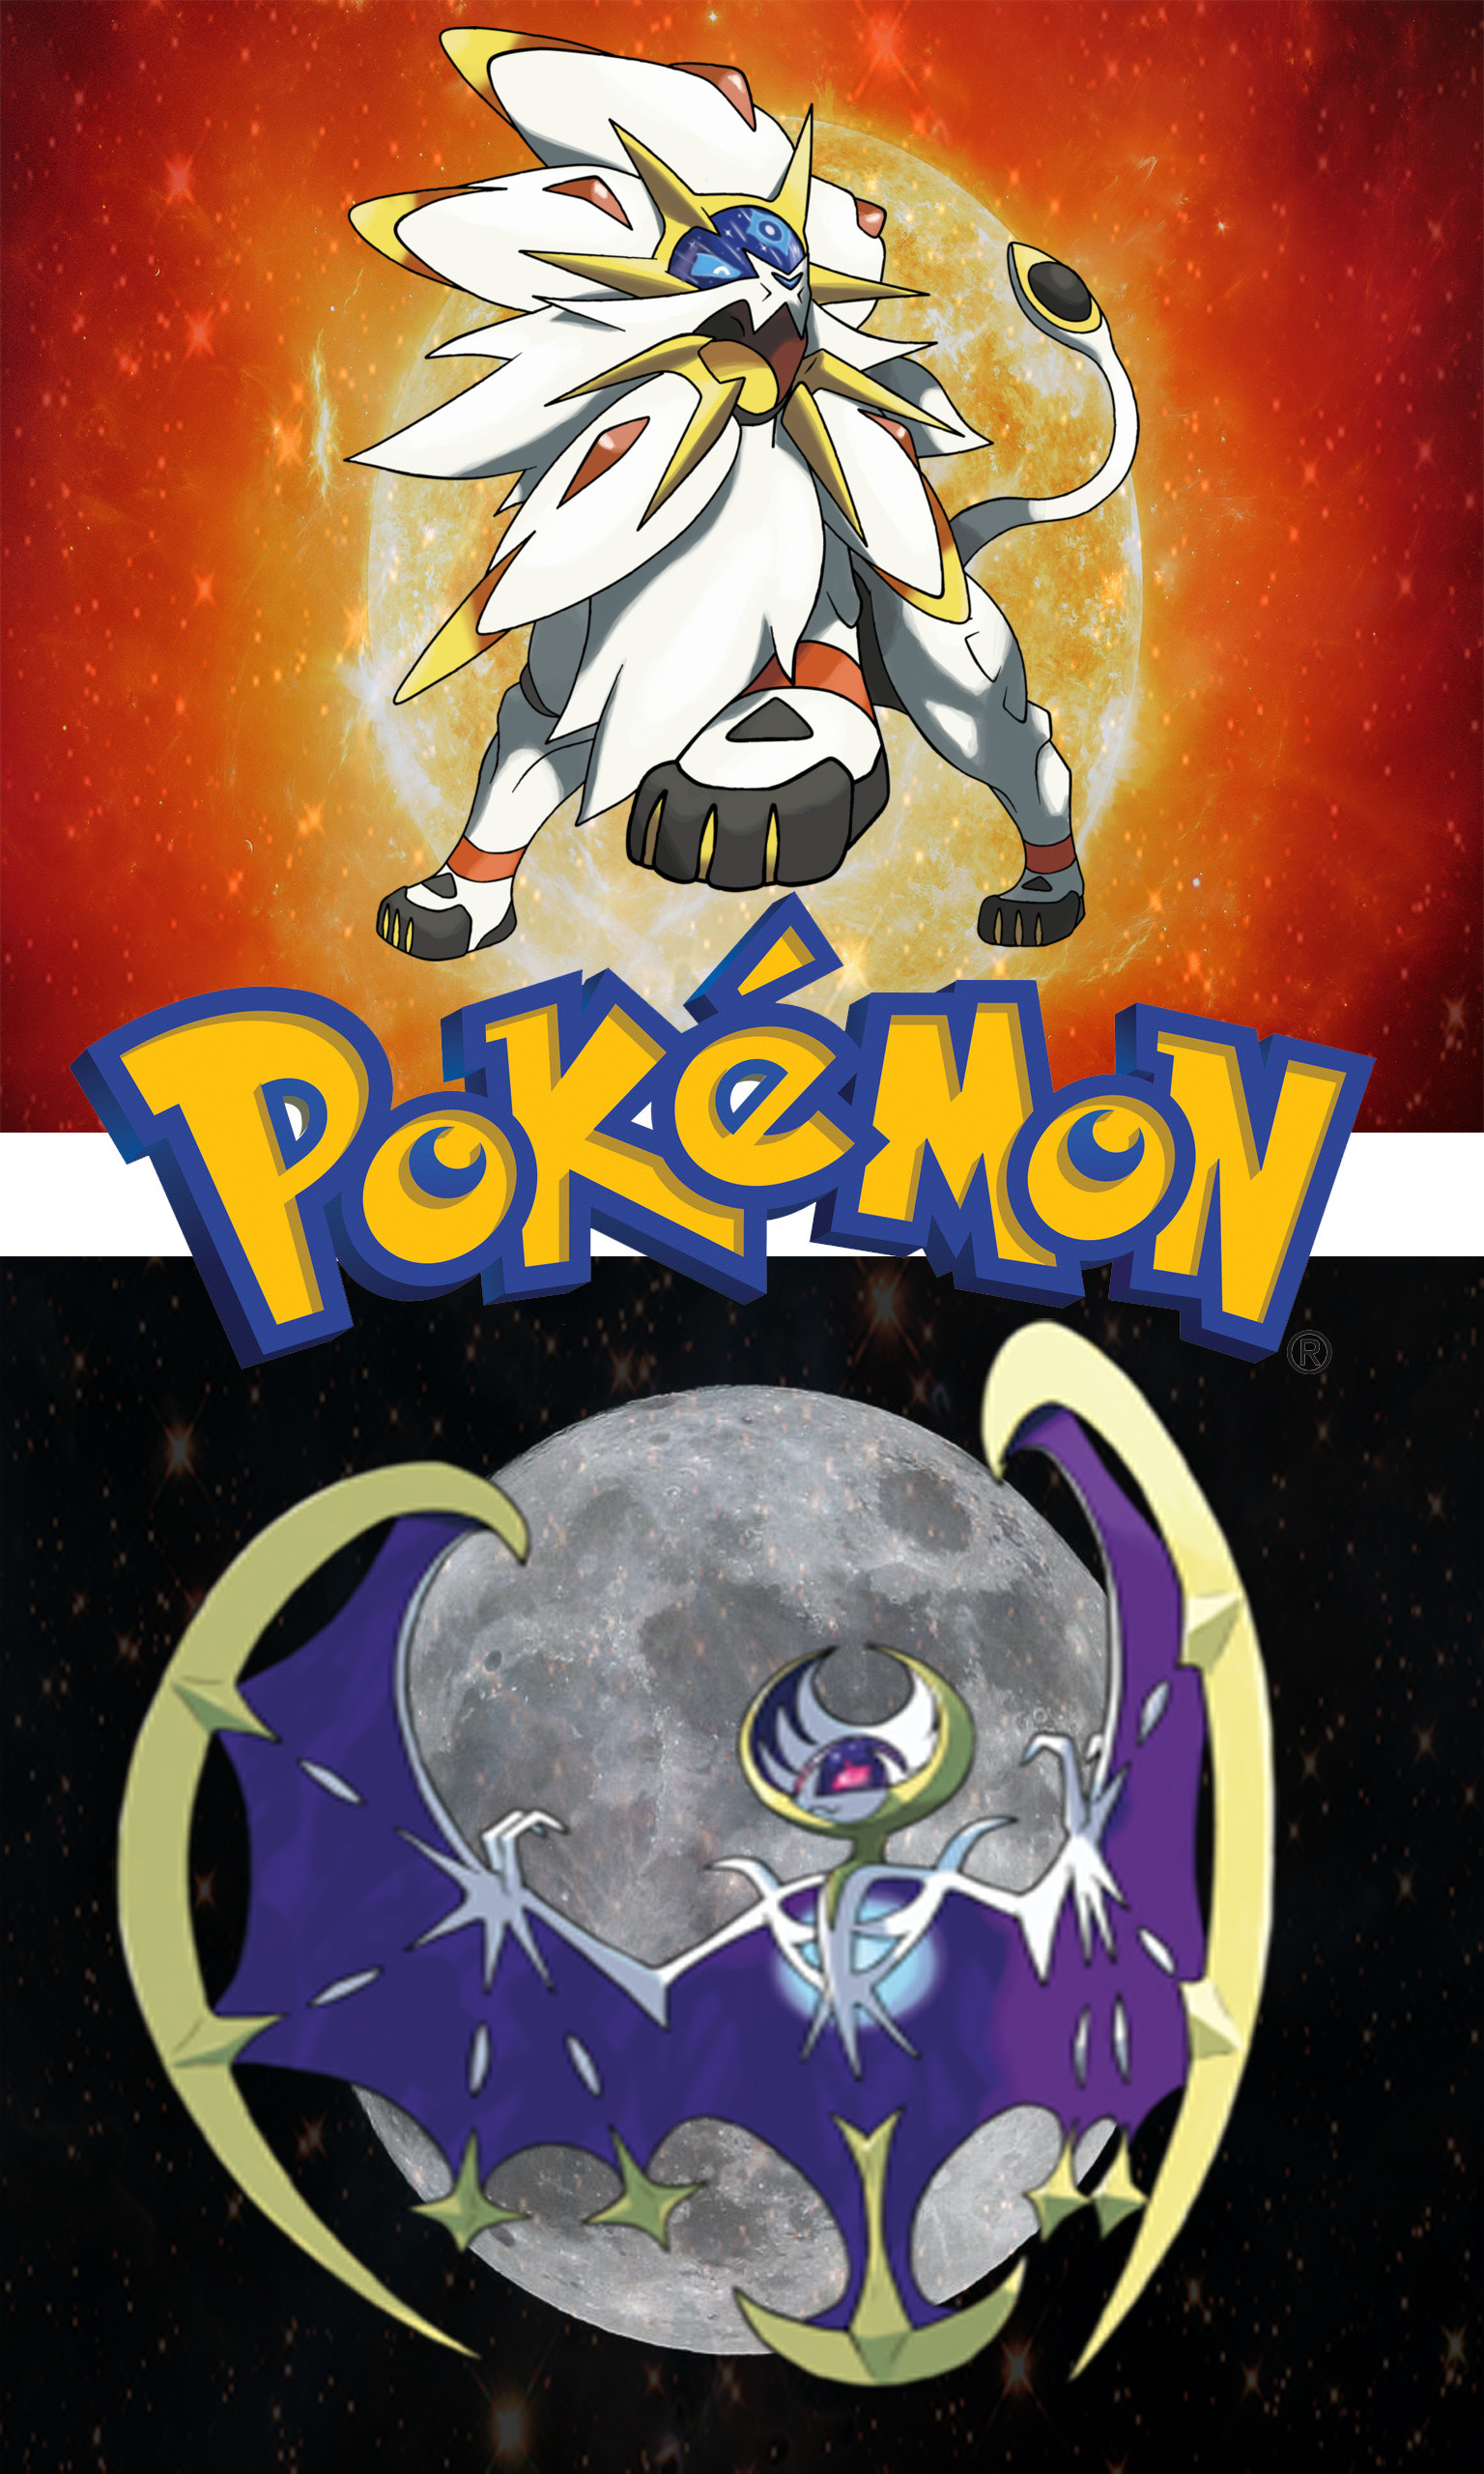 … Pokemon Sun and Moon wallpaper by zapdosongo